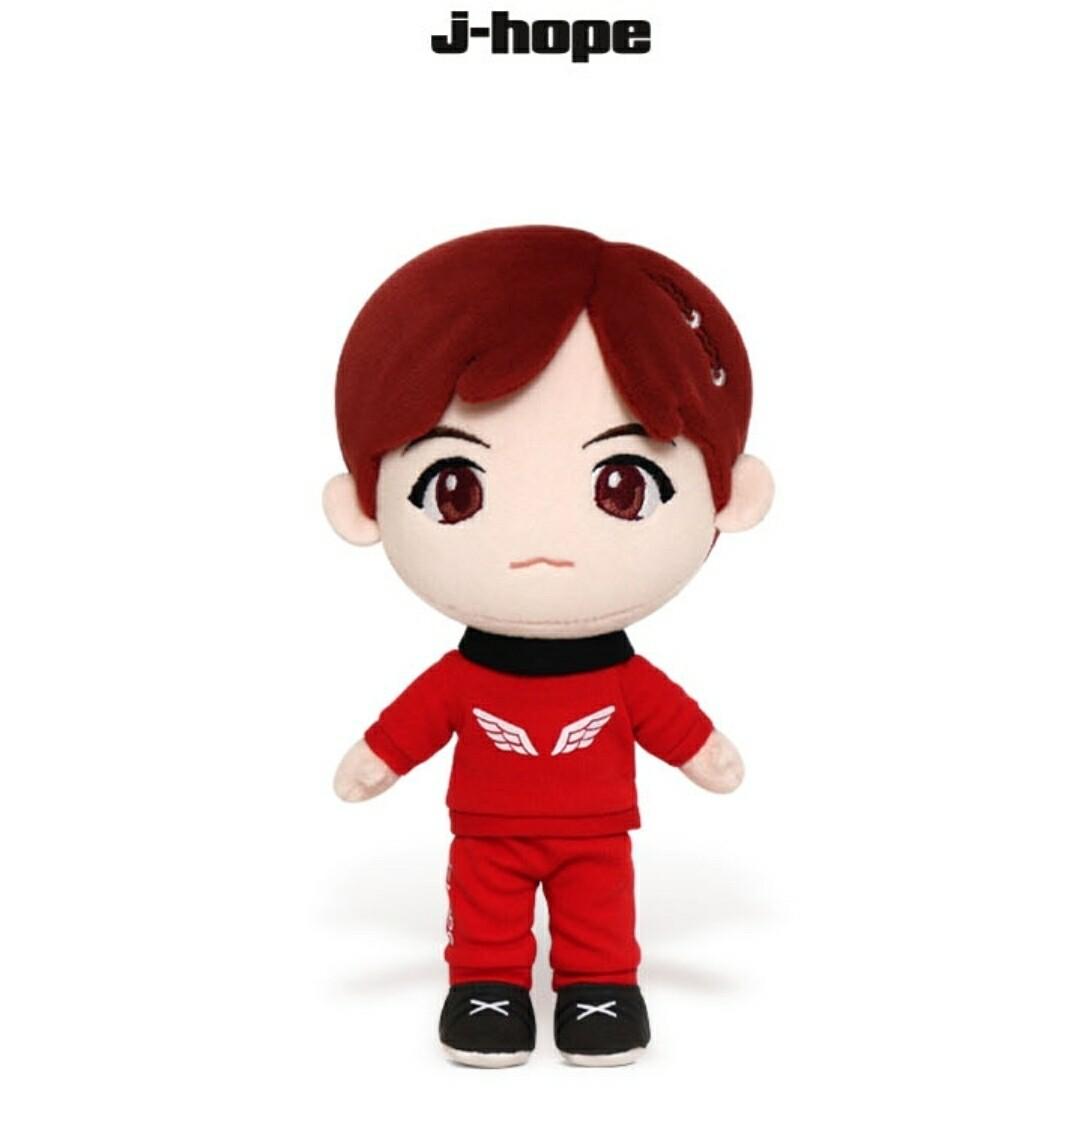 [Bajo Pedido] BTS J-HOPE Tiny Tan